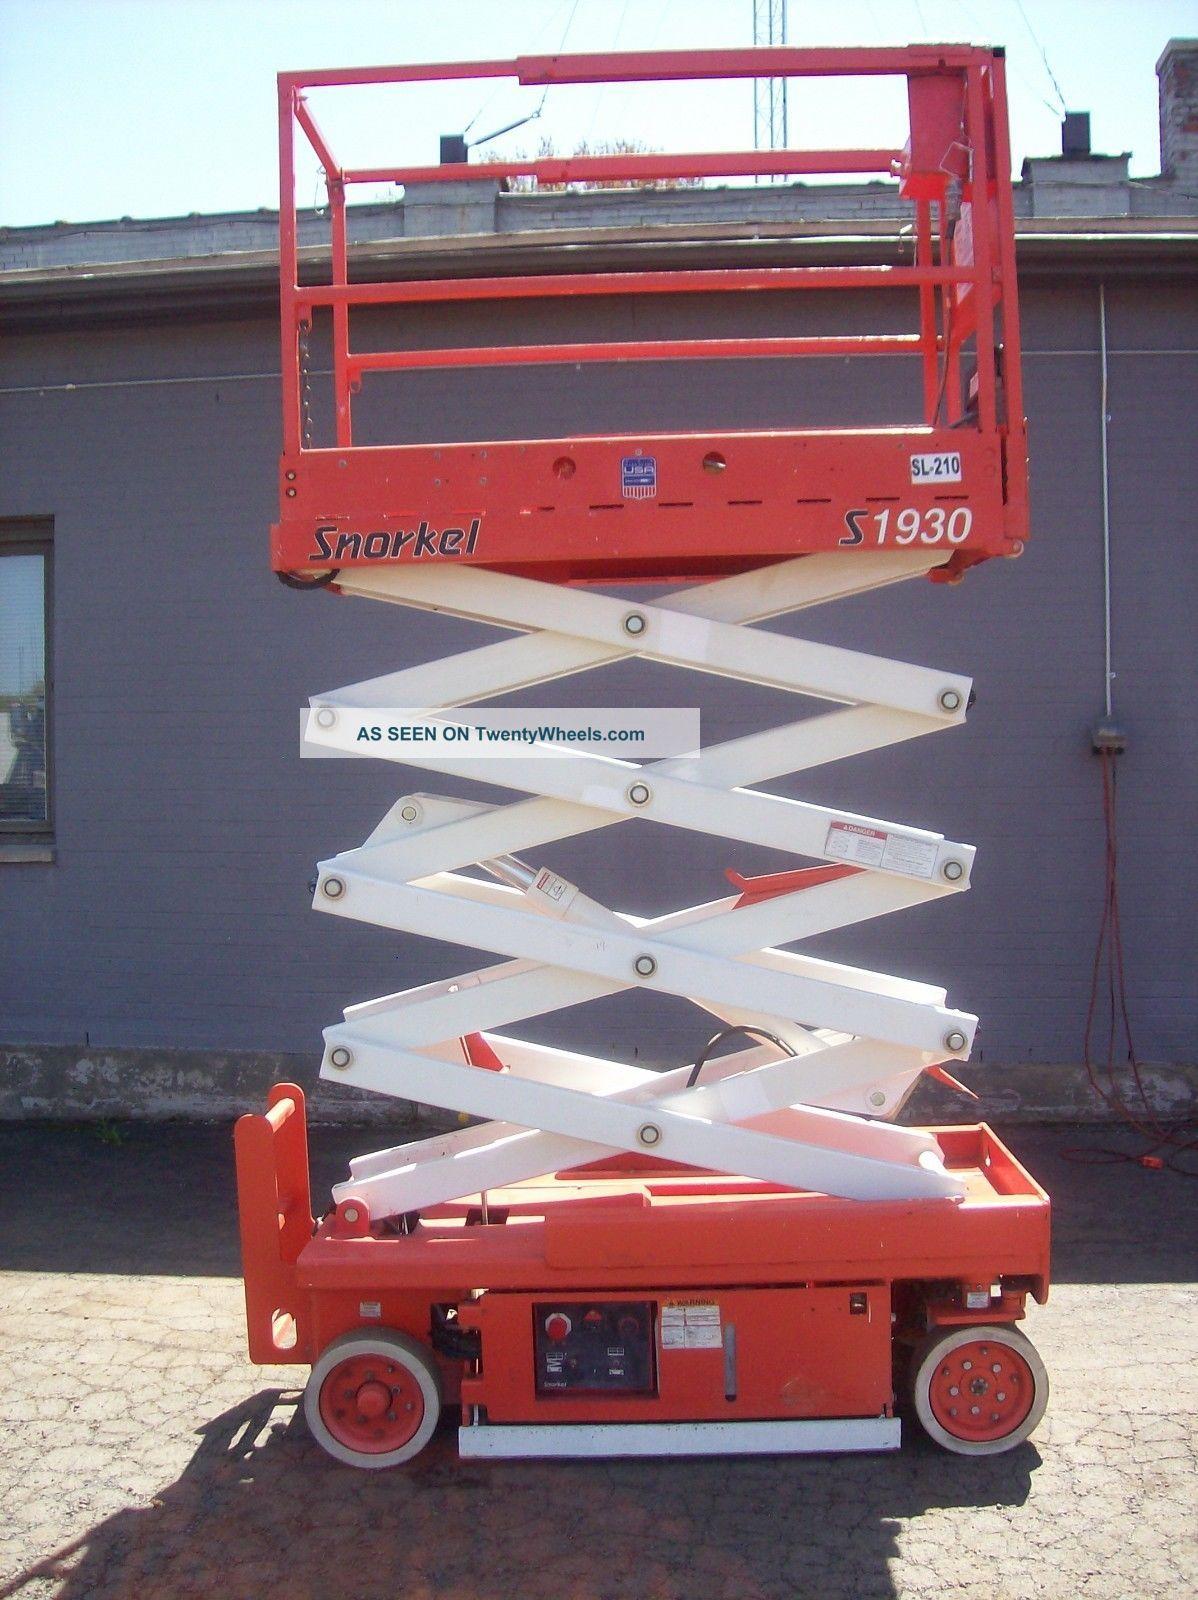 Snorkel Boom Lift Wiring Diagram Schematic Diagrams Man Lifts Electric Schematics Aerial